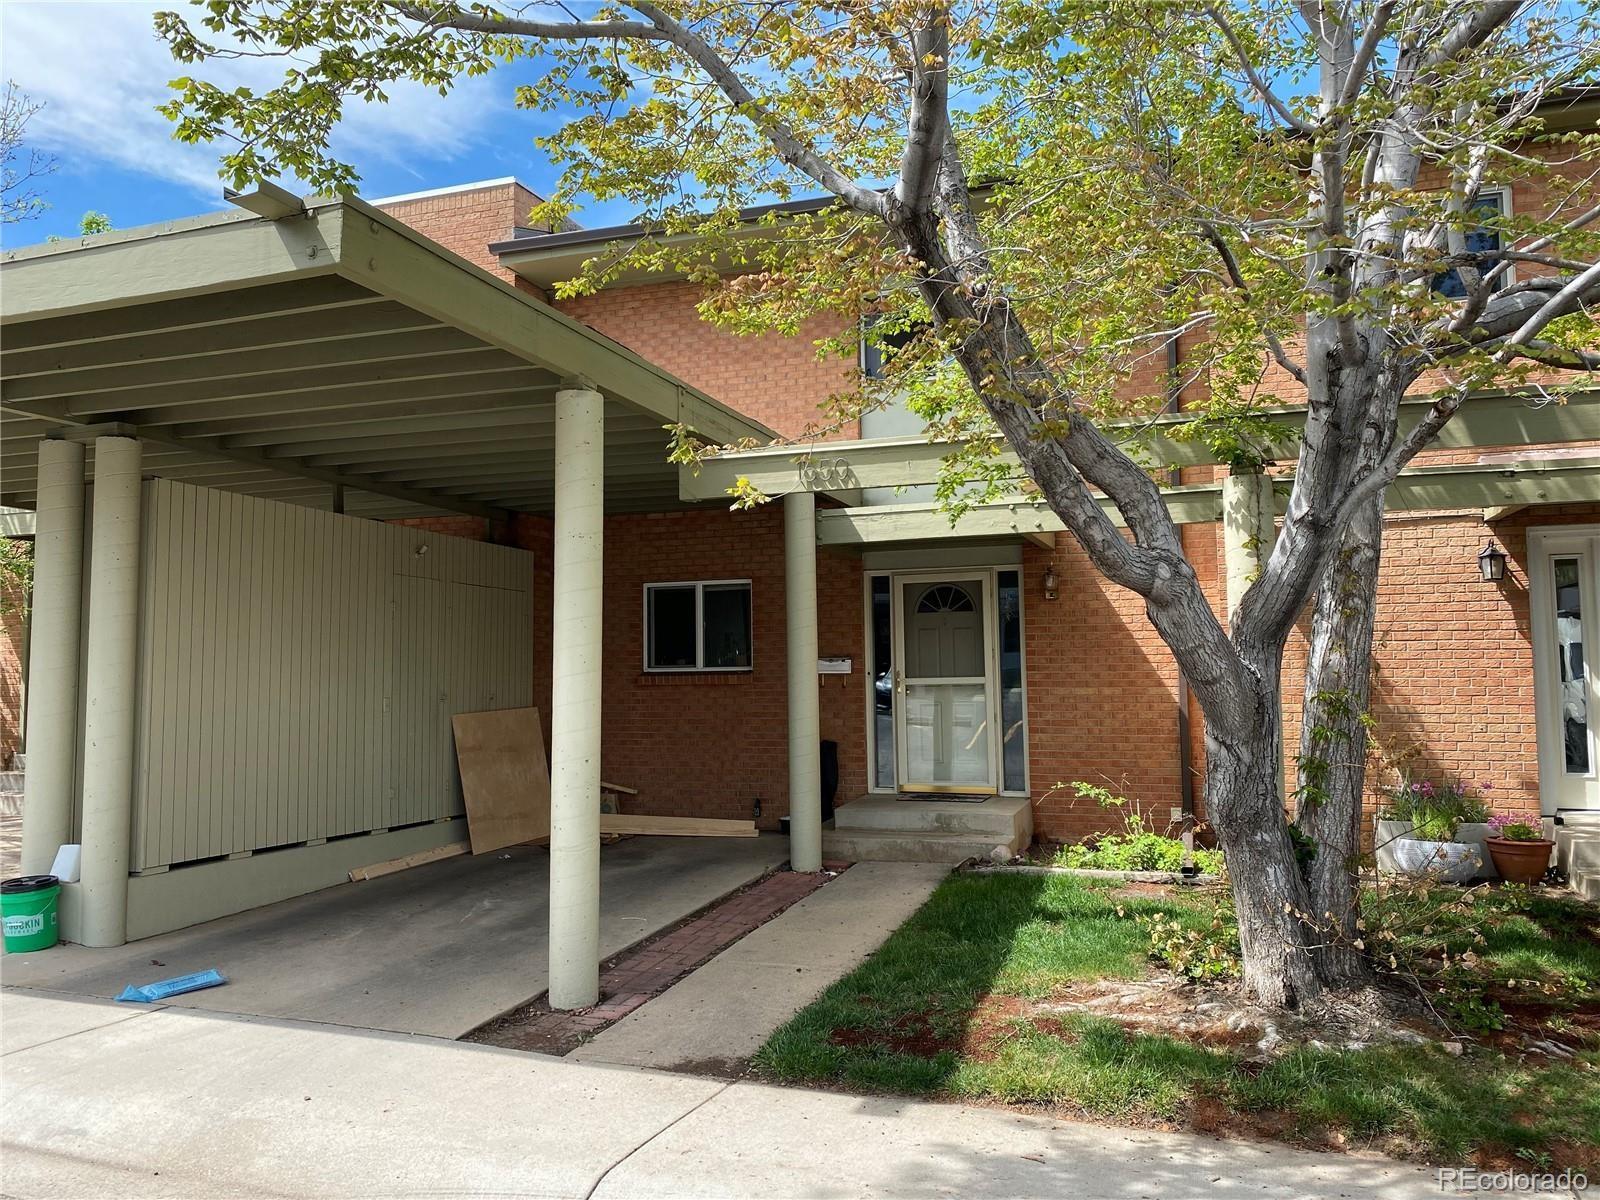 MLS# 5956538 - 1 - 1550 Chambers Drive, Boulder, CO 80305